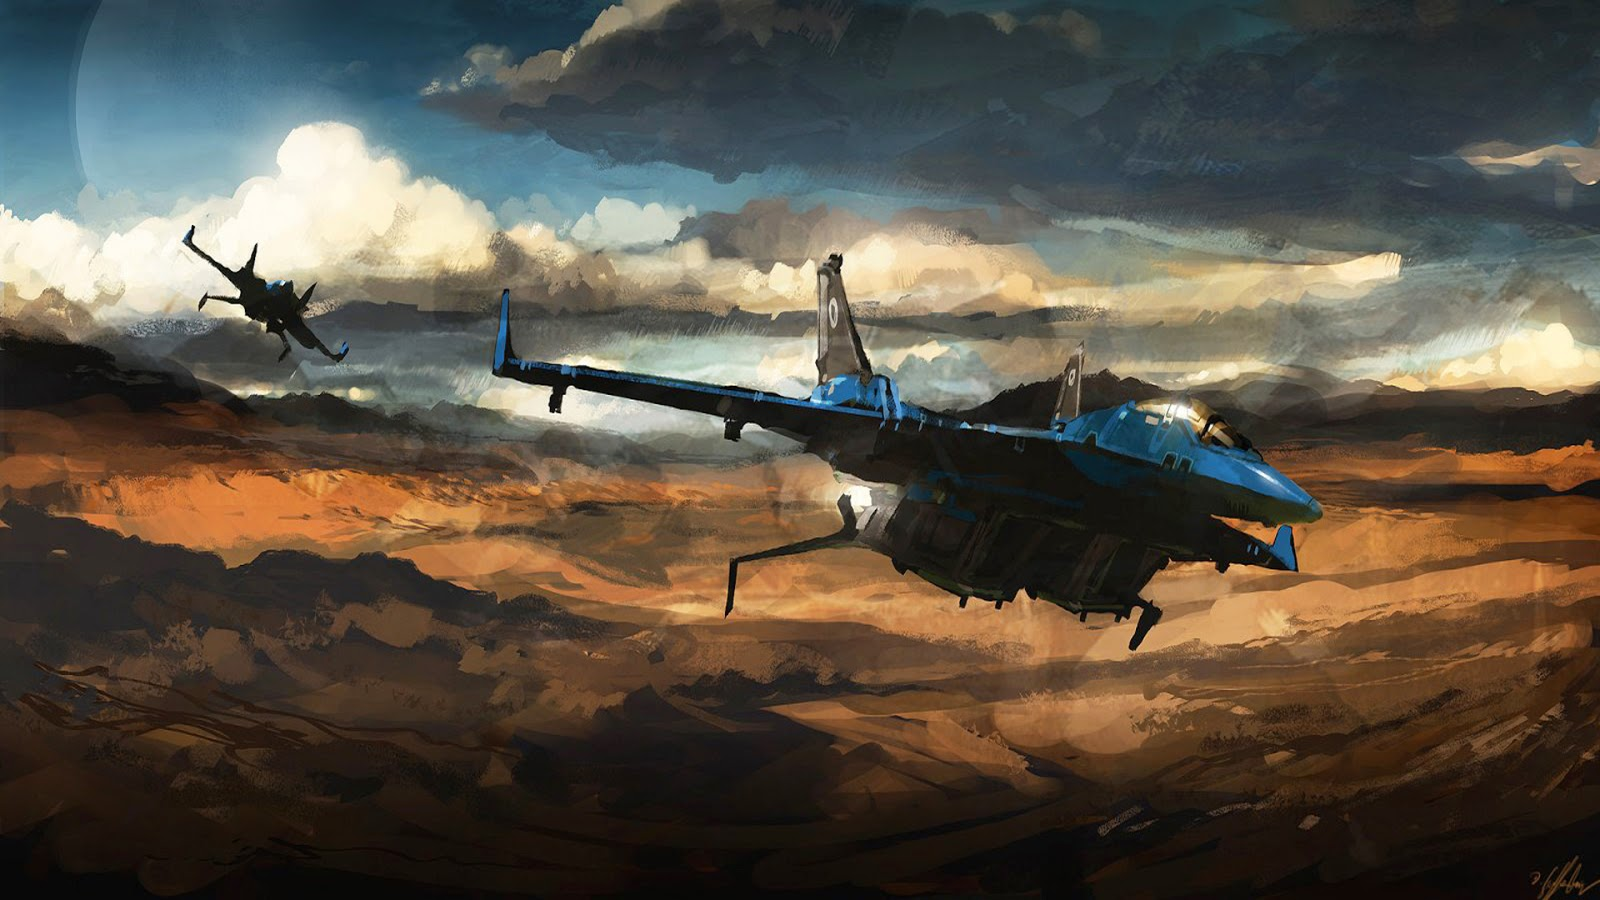 43 fighter jet wallpaper hd on wallpapersafari - Jet wallpaper ...